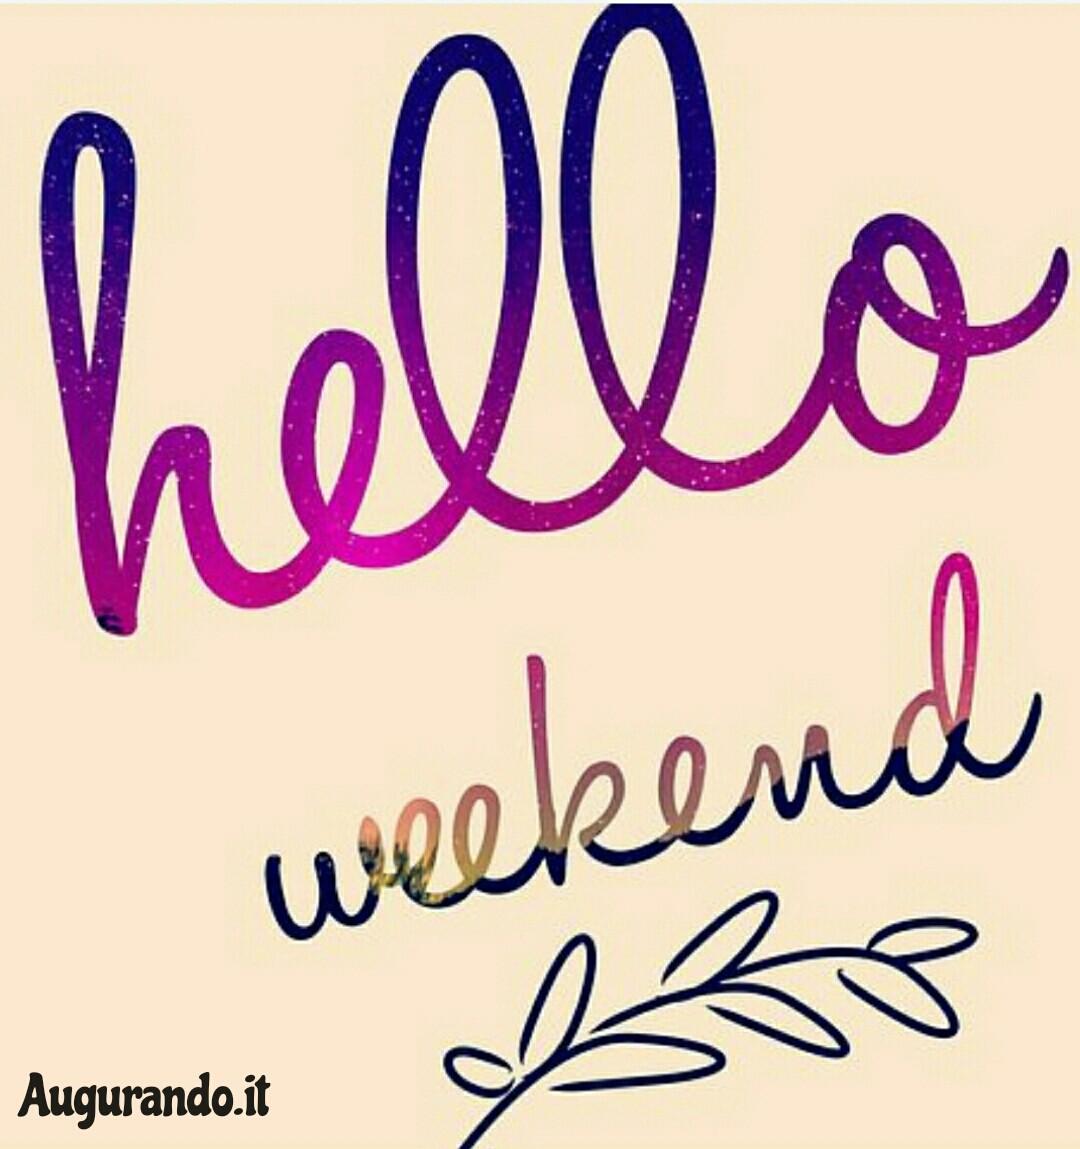 Buon weekend, immagini weekend, sereno fine settimana, sereno weekend, felice weekend, buon weekend a tutti, hello weekend, buon weekend amici